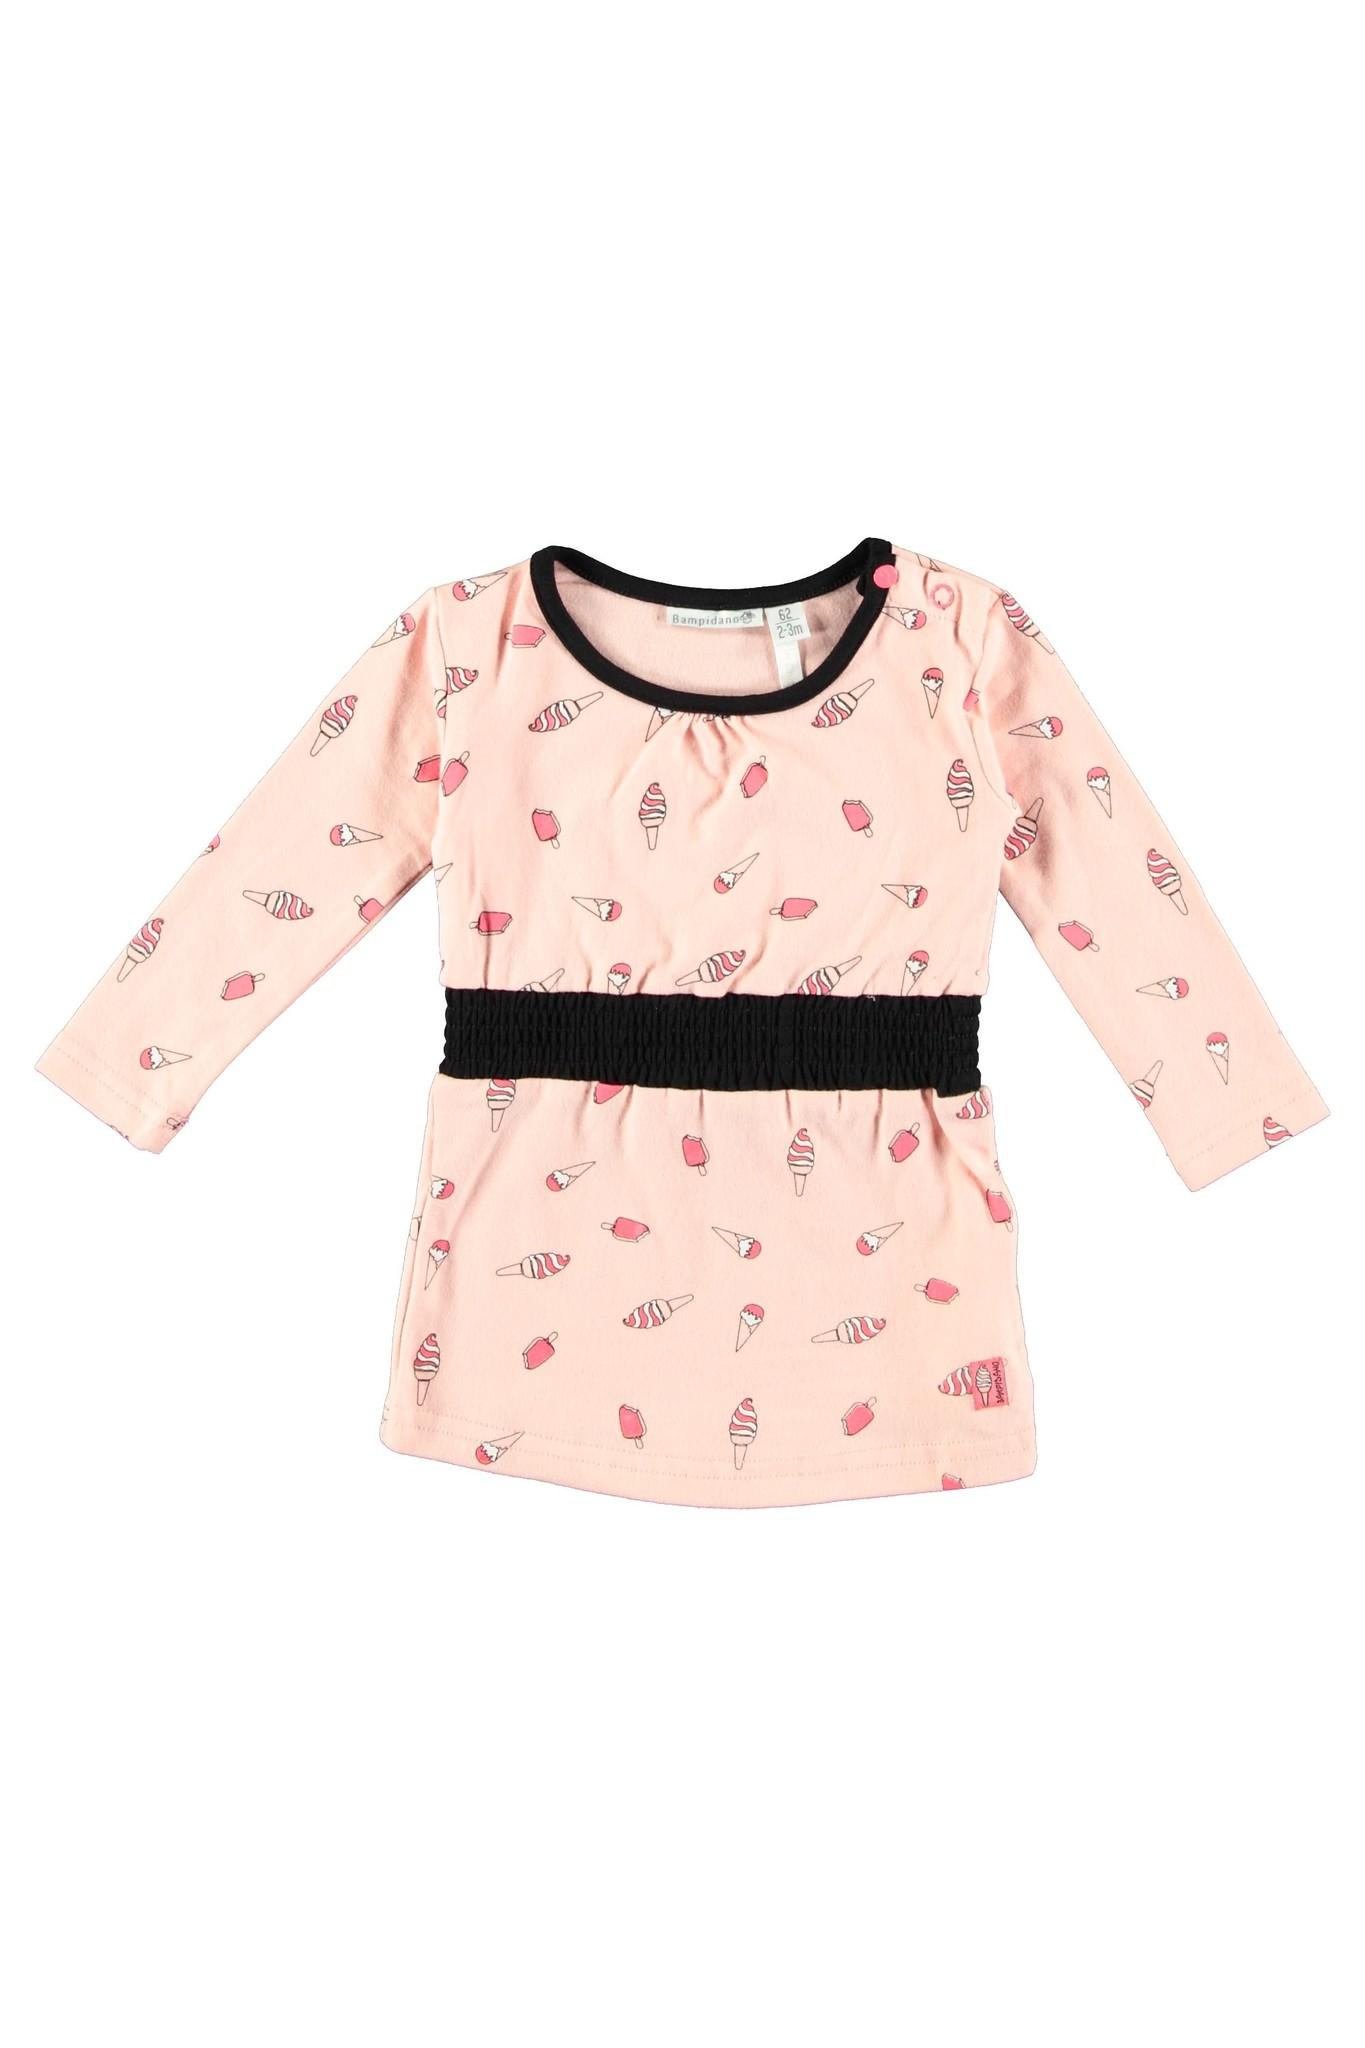 Bampidano Bampidano jurkje allover print with pleats + rib waist light pink